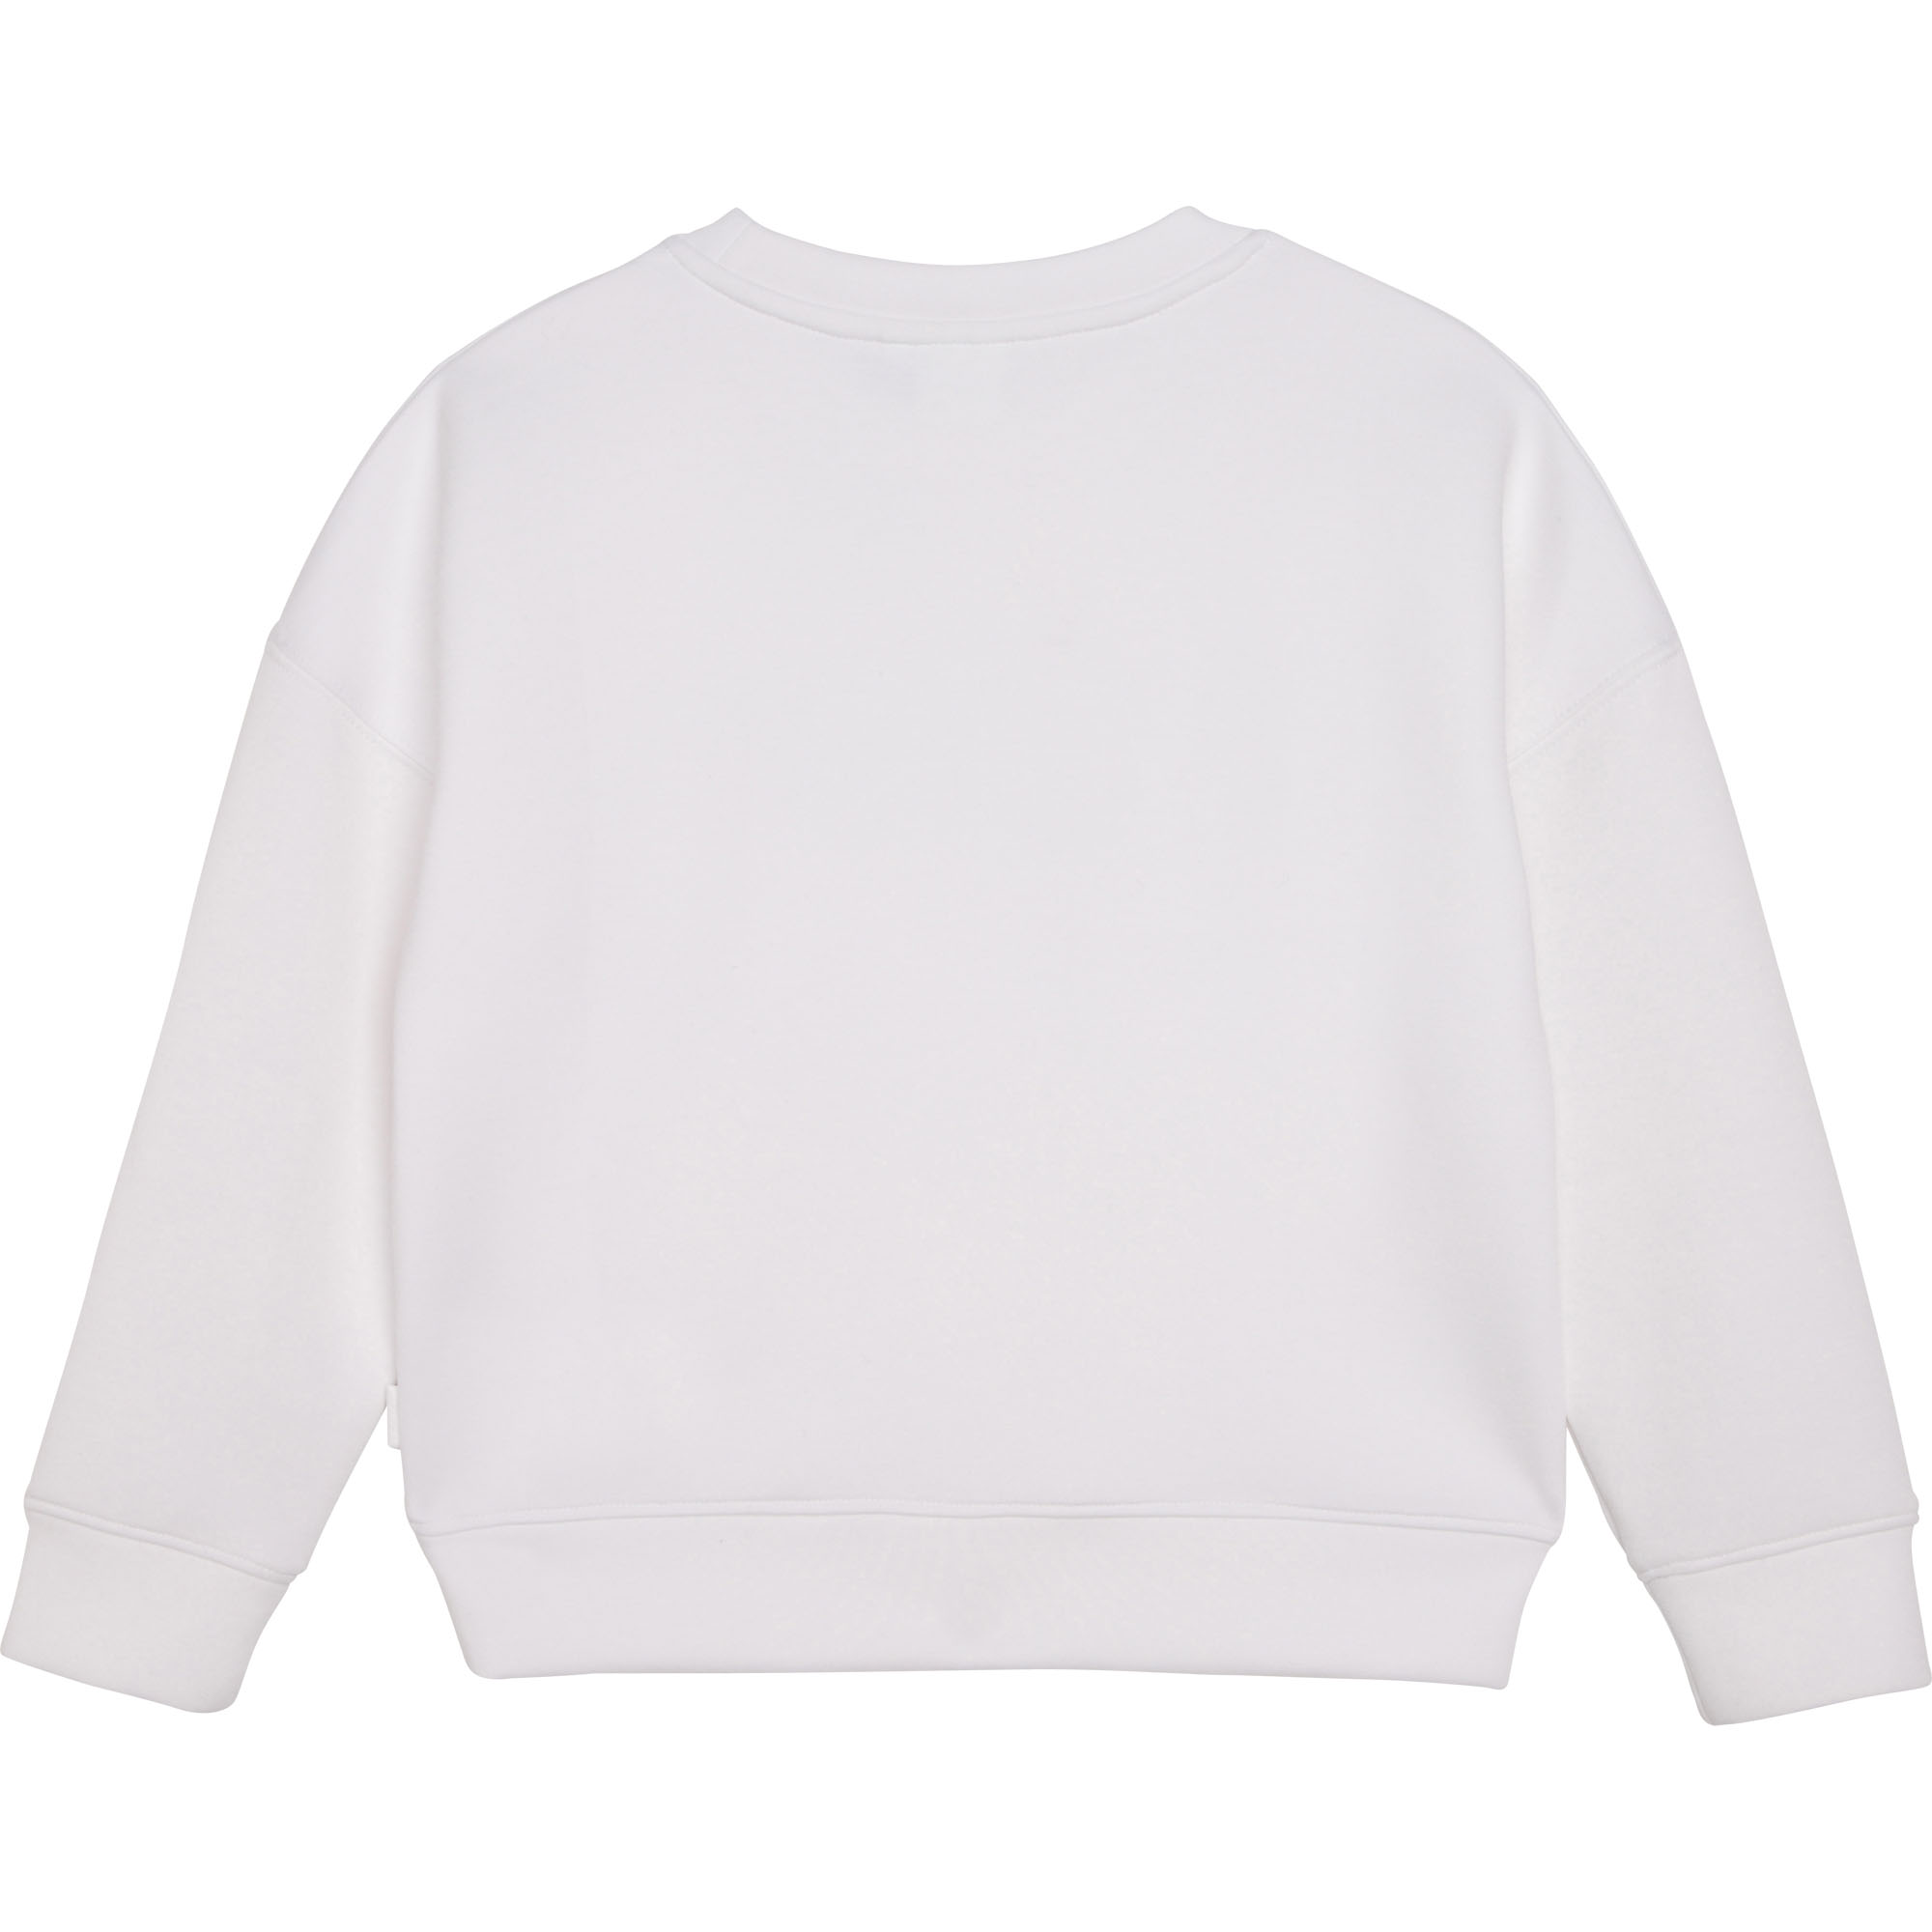 Embroidered logo sweatshirt BOSS for GIRL